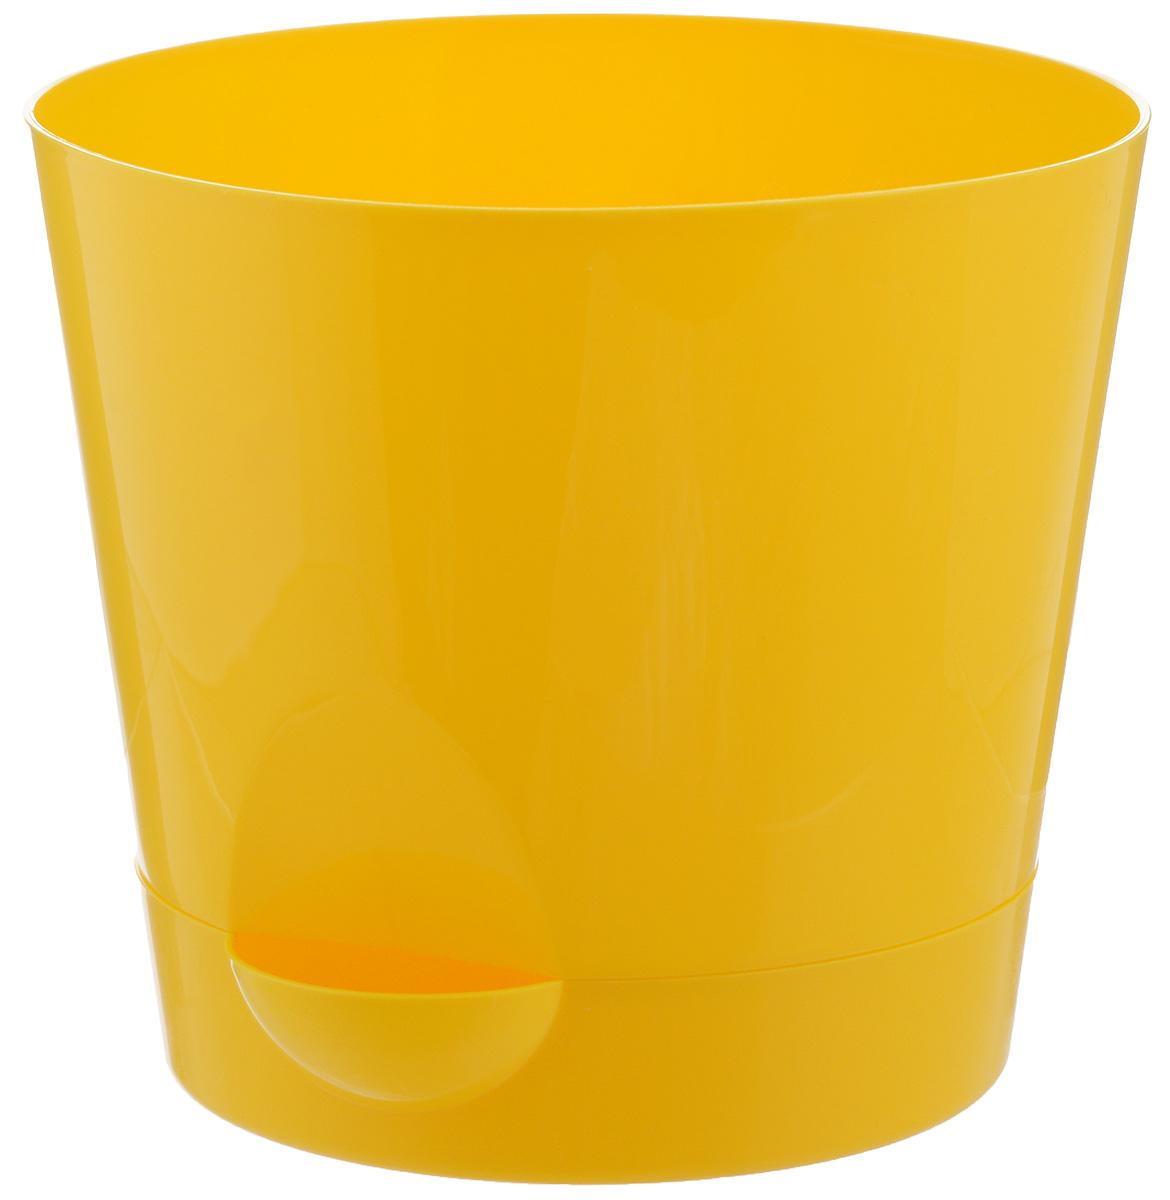 "Idea (М-пластика) Кашпо Idea ""Ника"", с прикорневым поливом, с поддоном, цвет: желтый, 2,7 л М 3073"